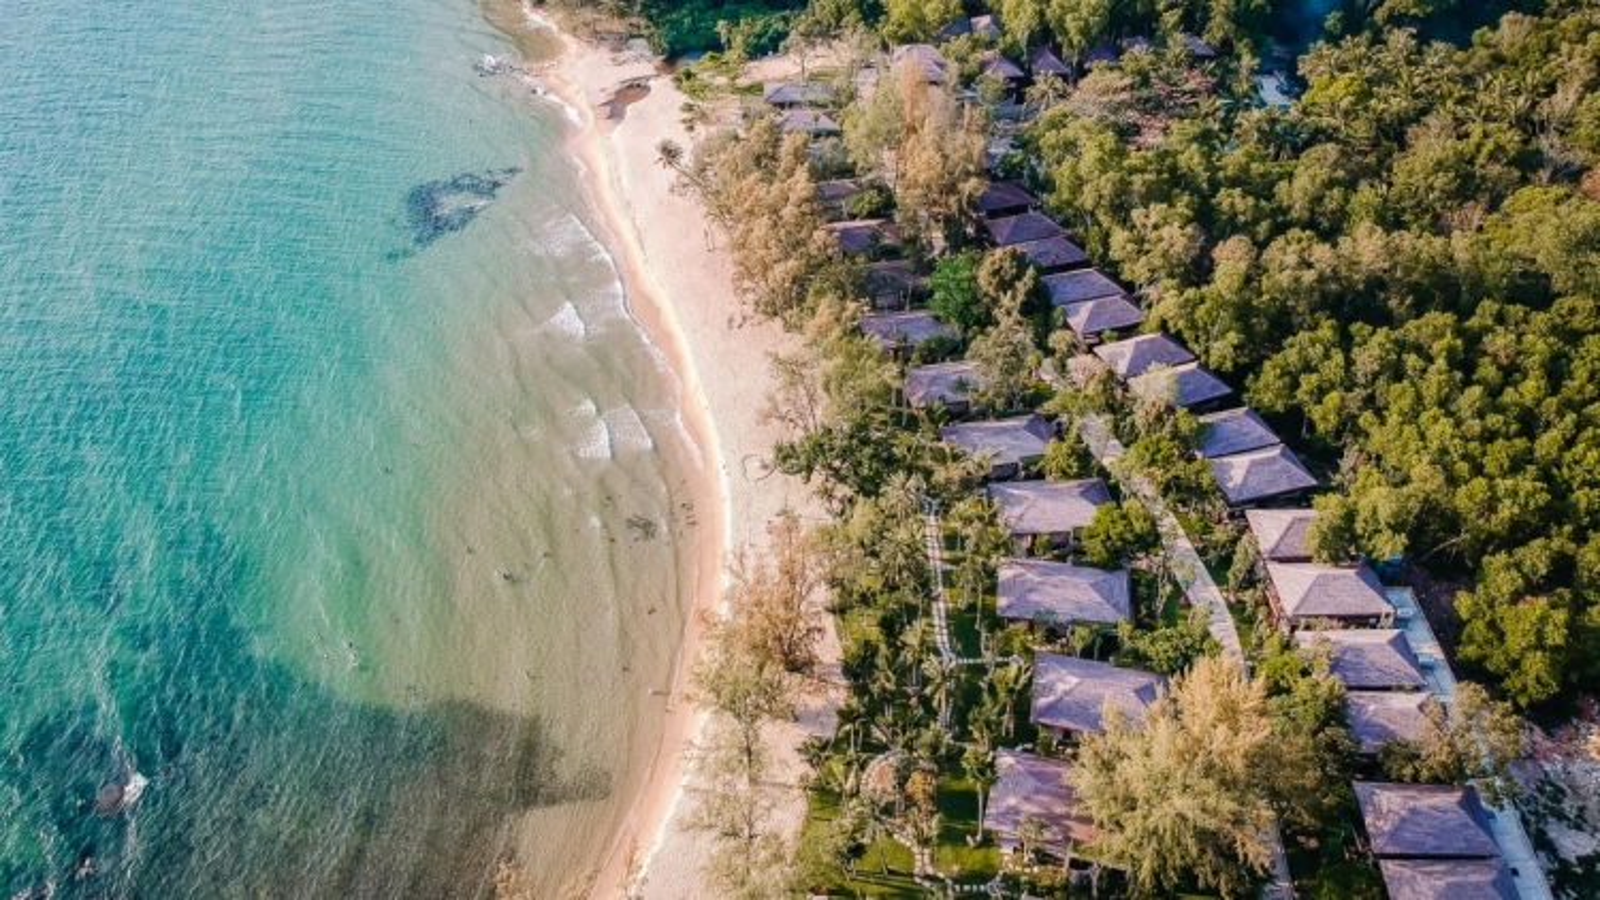 Phu Quoc, Khanh Hoa prepared to welcome back international tourists